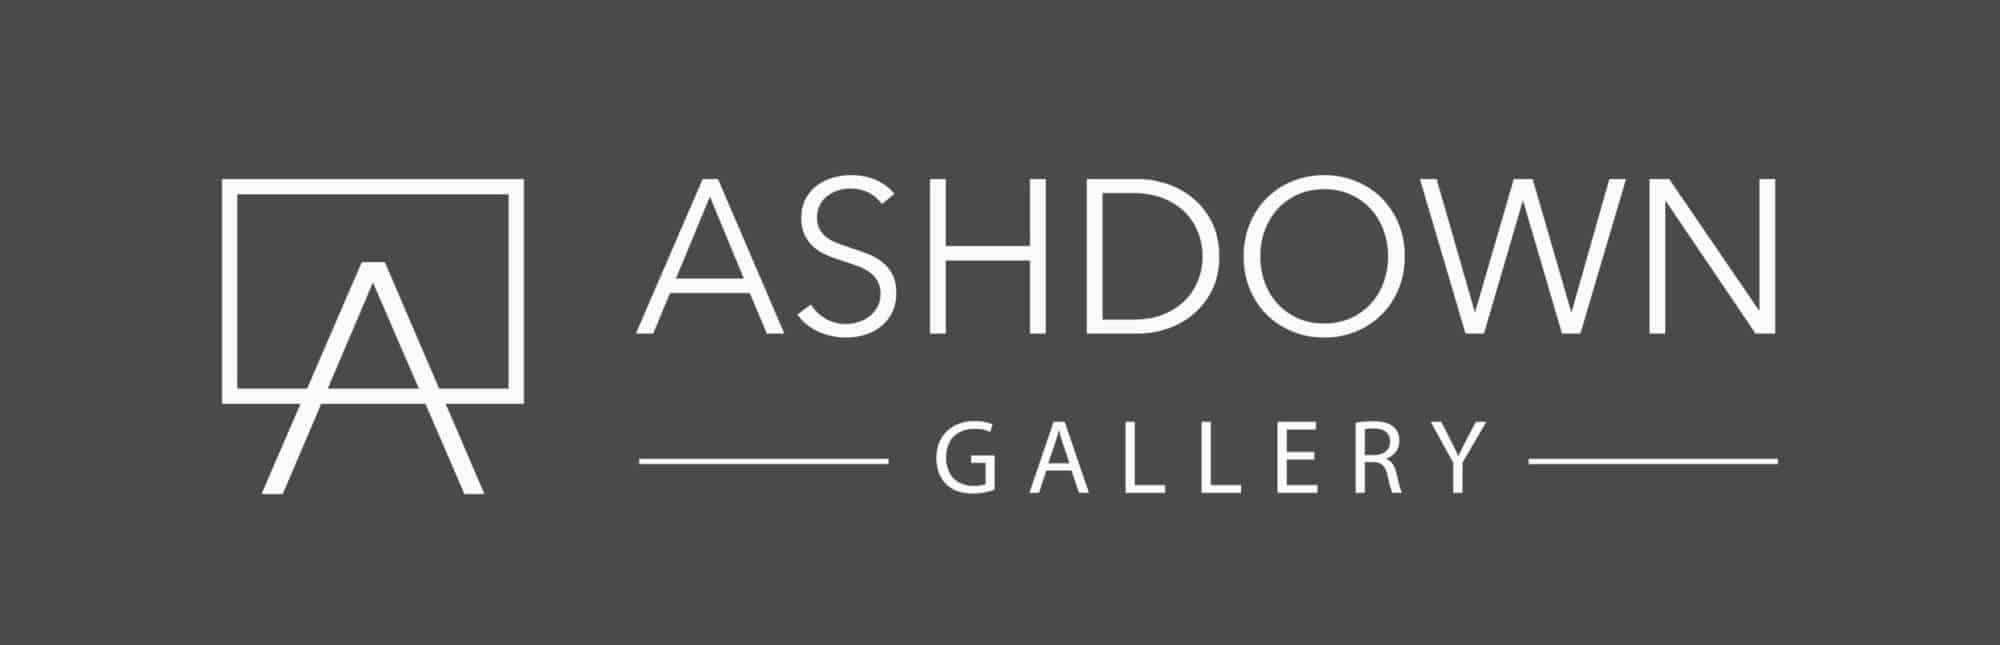 ashdown-gallery-logo-white-tall